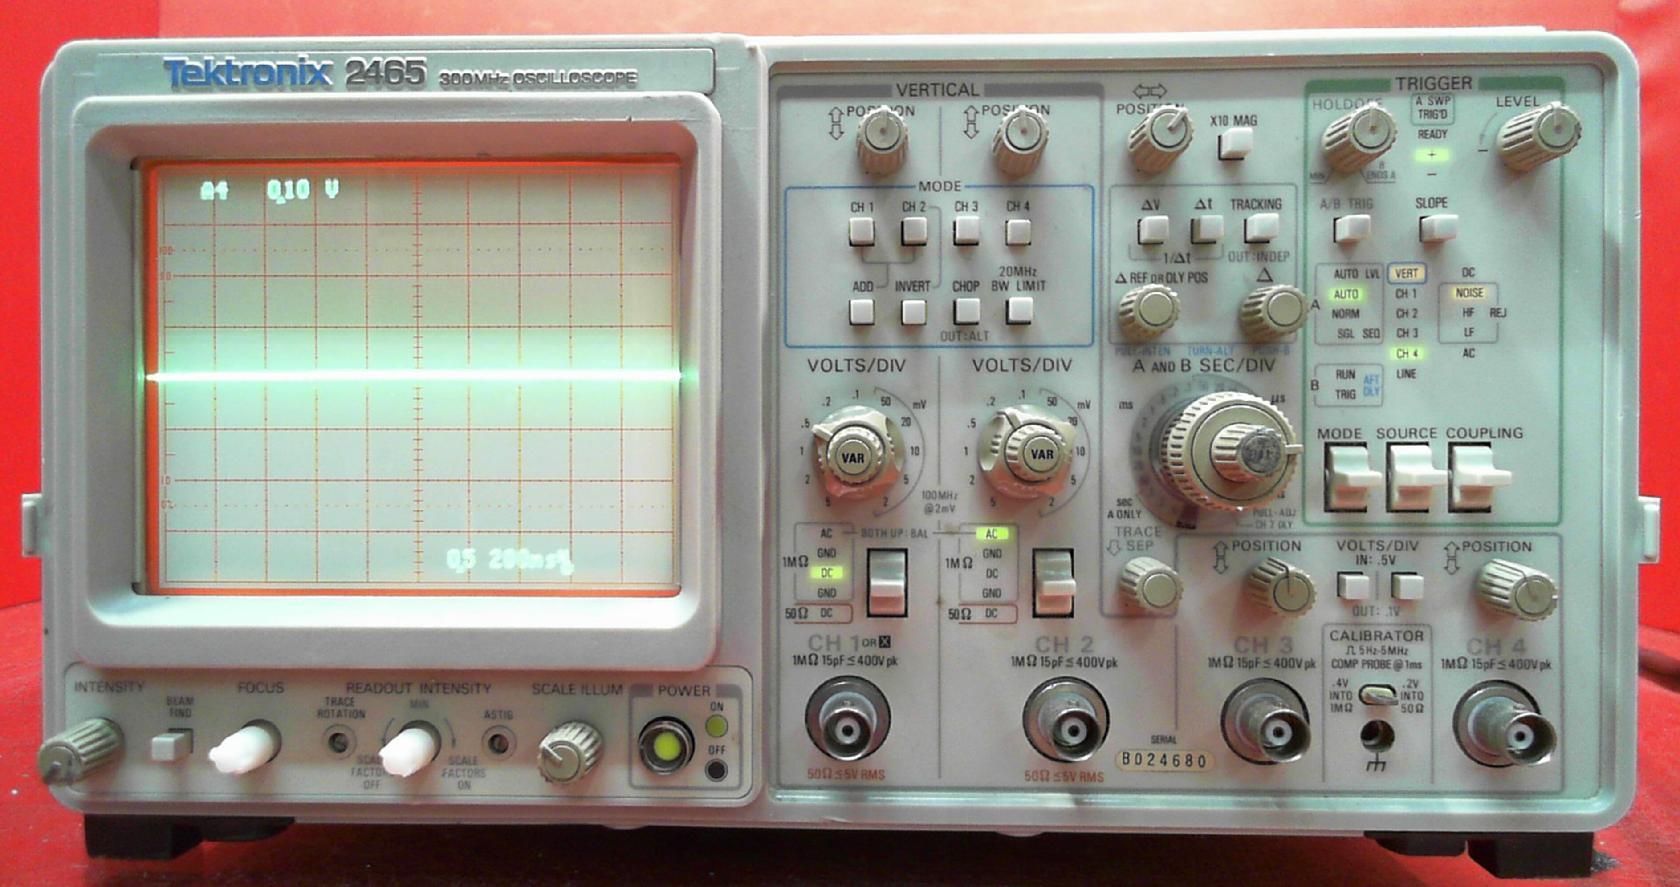 4pcs100MHz Oscilloscope Scope Analyzer Clip Probe Test Lead kit for HP Tektronix